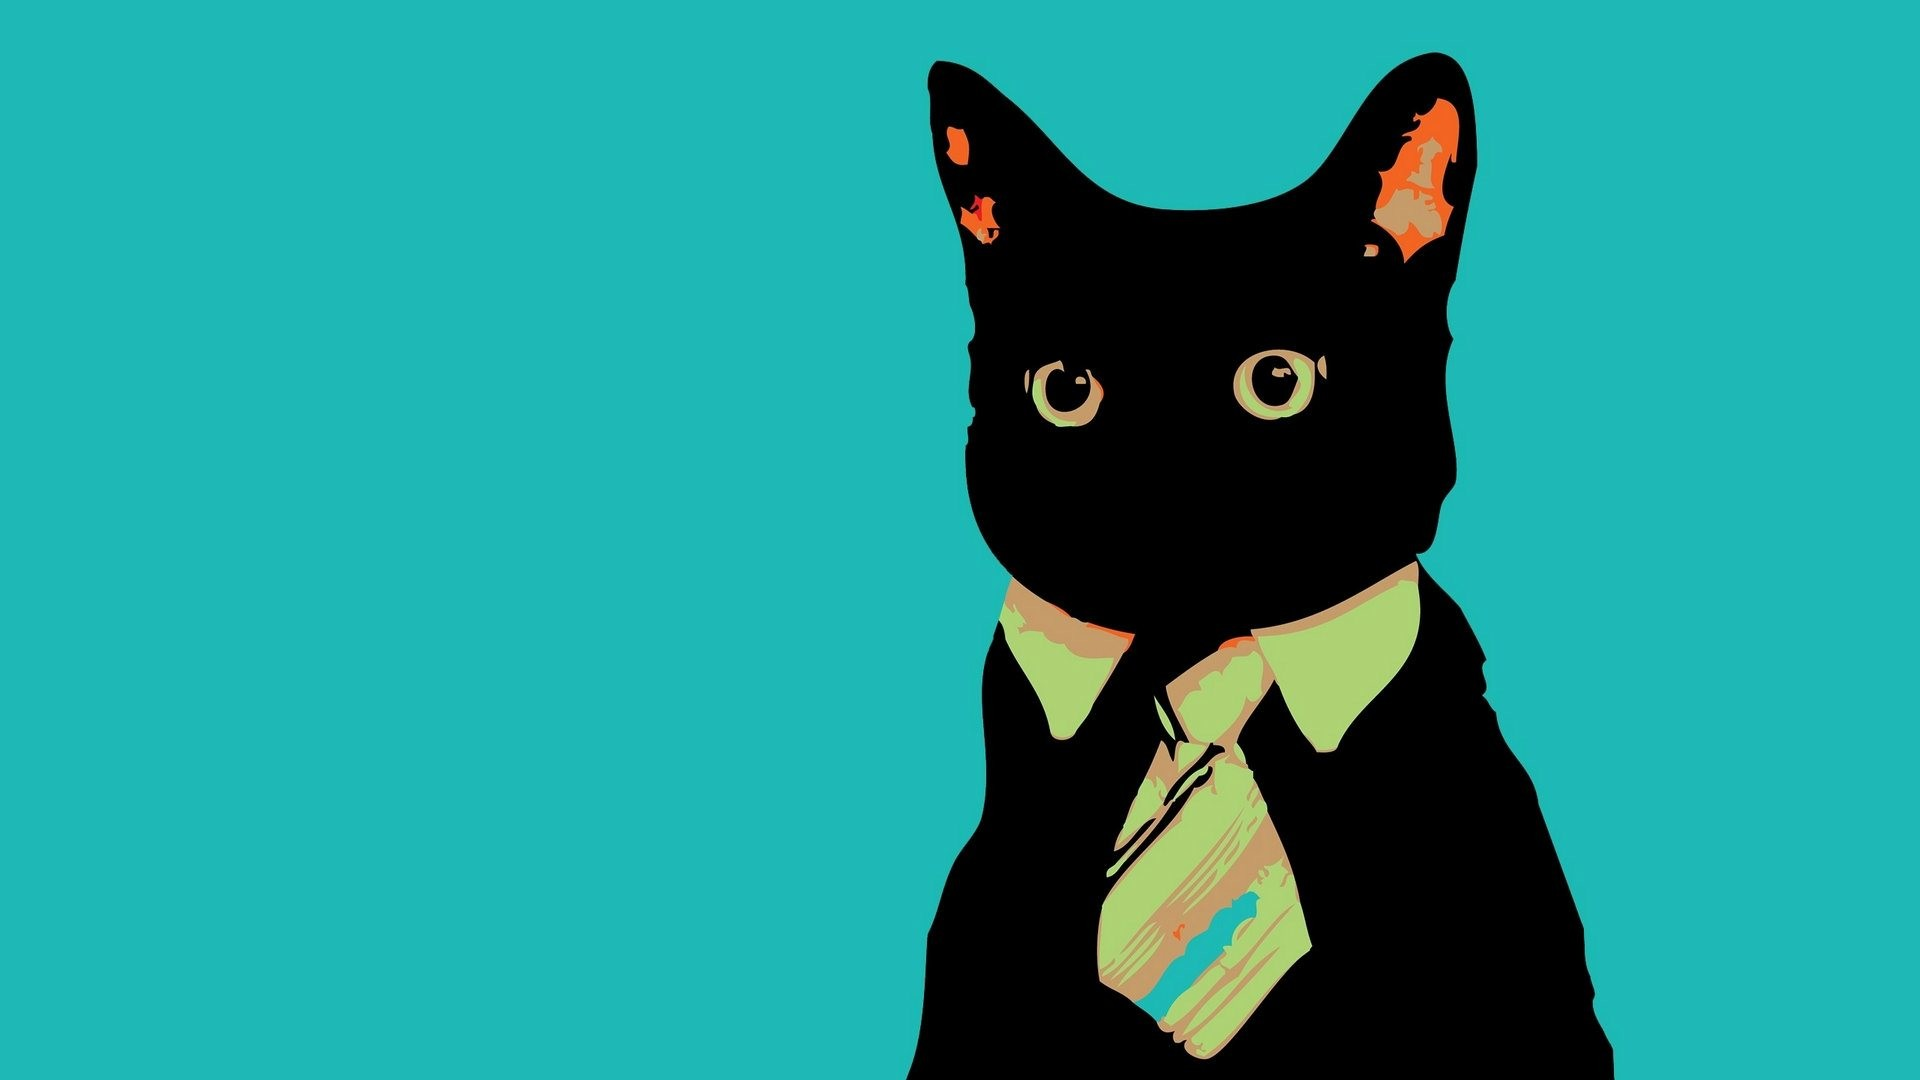 Black Cat Art HD Desktop Backgrounds, Wallpapers